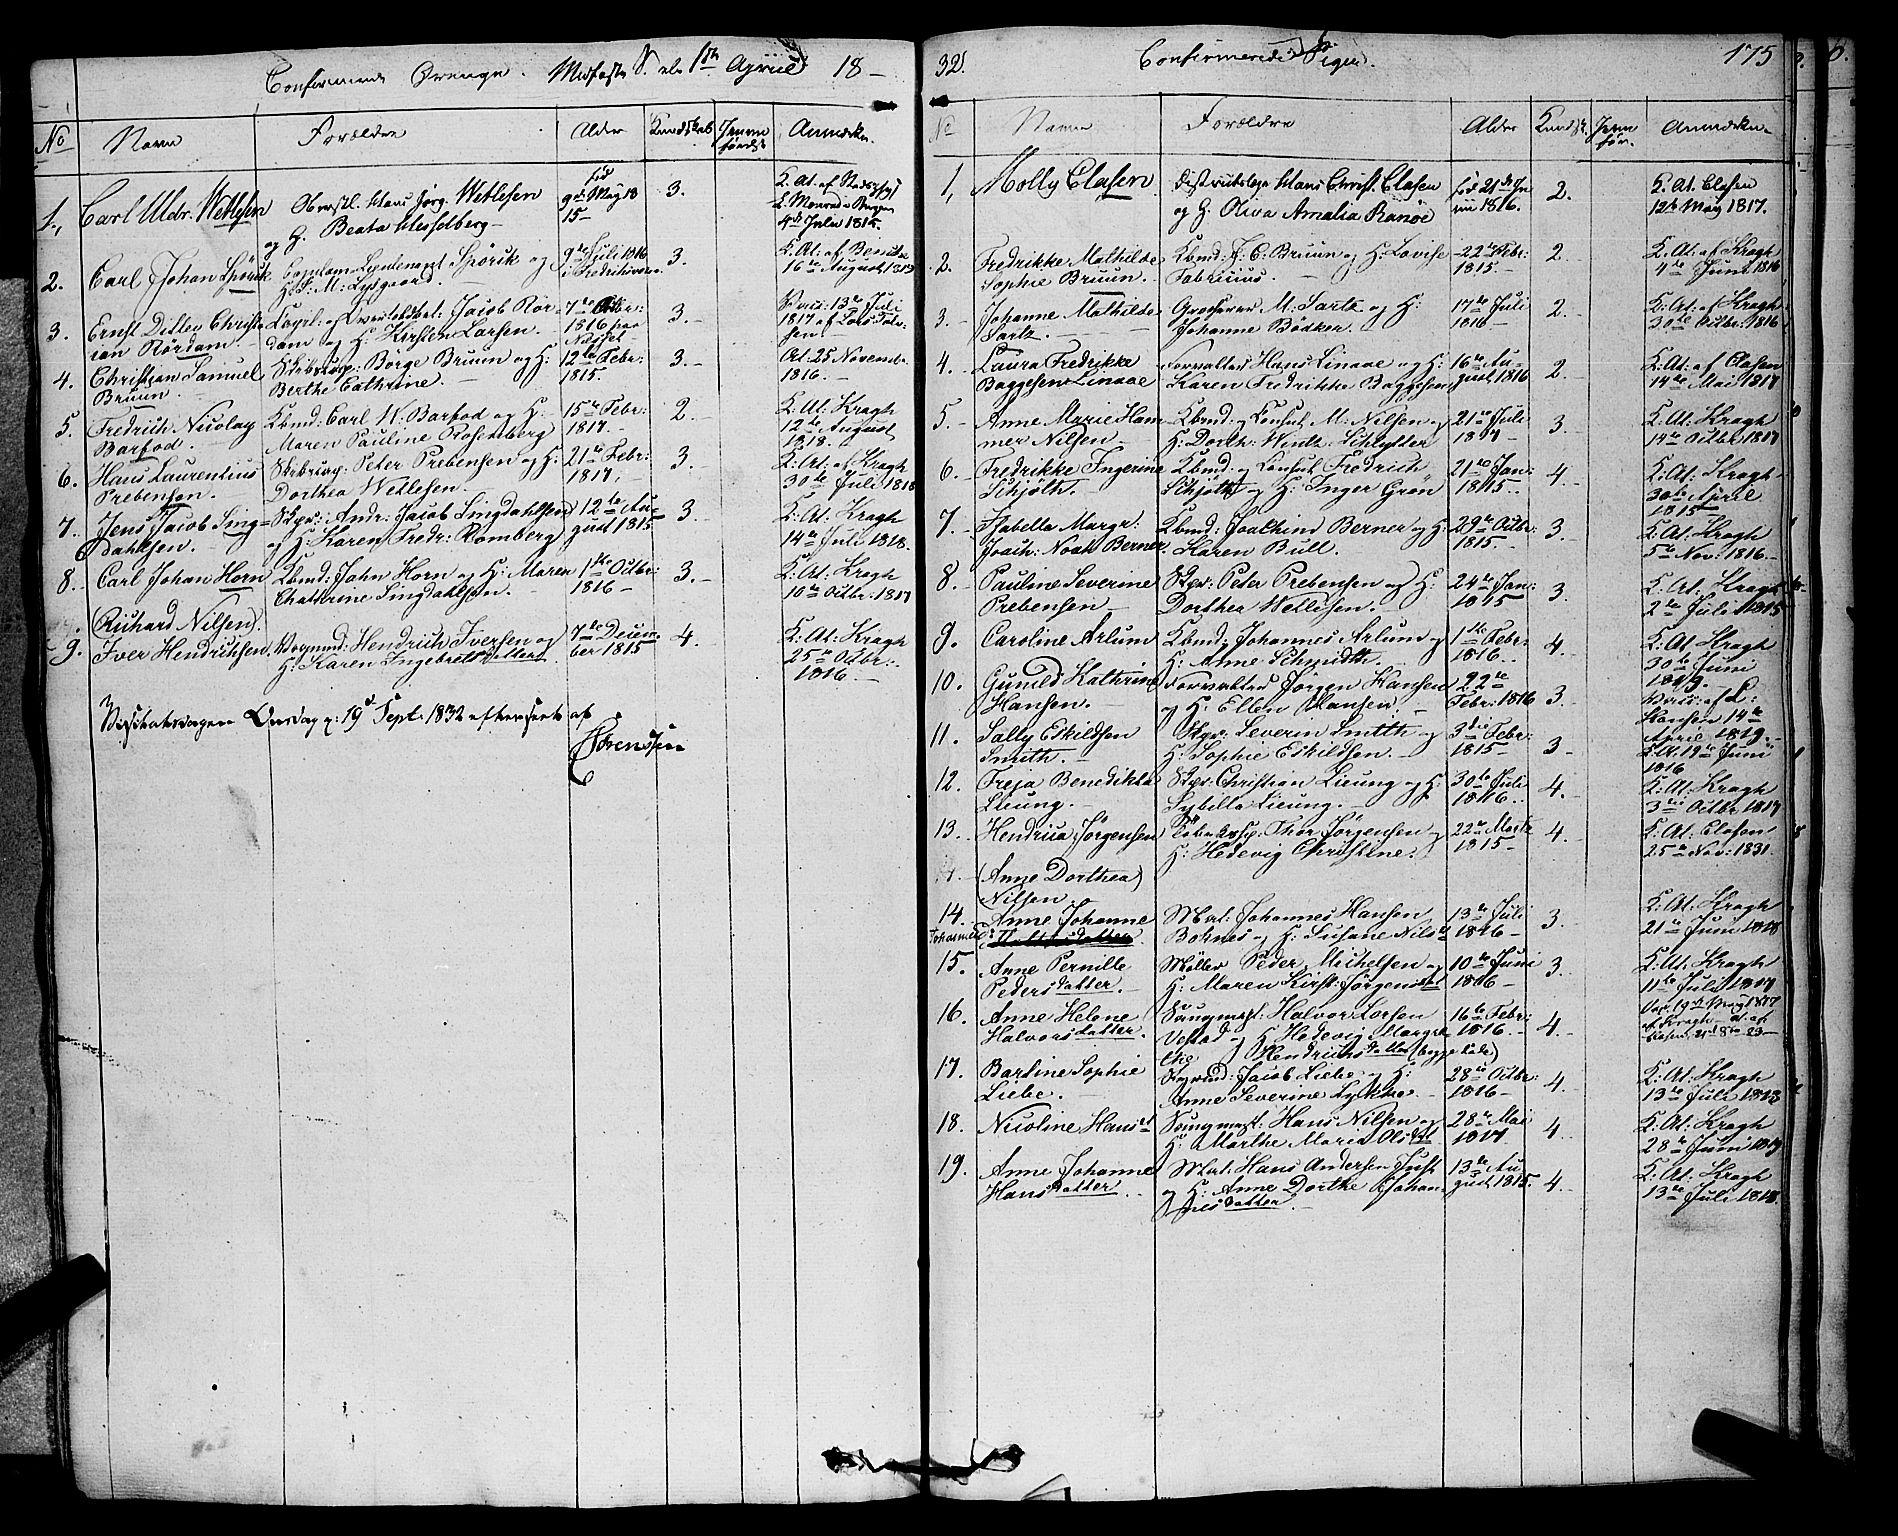 SAKO, Larvik kirkebøker, F/Fa/L0002: Ministerialbok nr. I 2, 1825-1847, s. 175